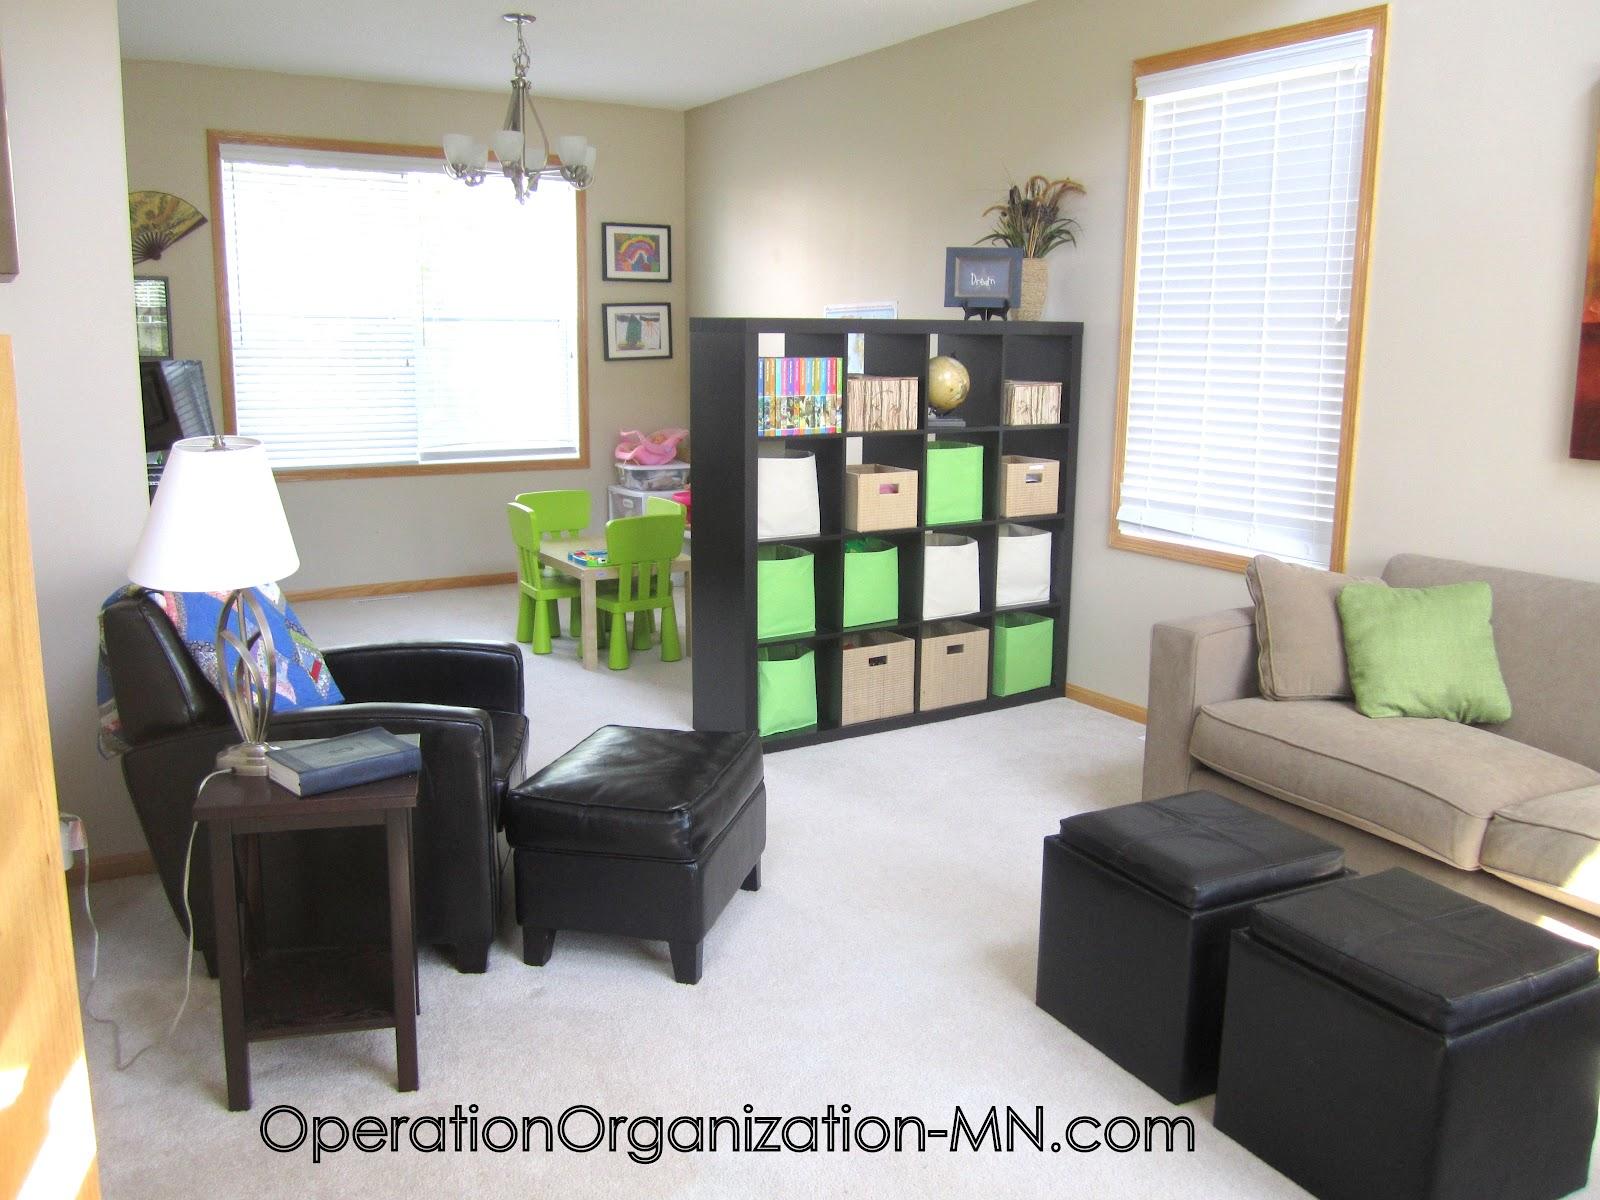 Living Room Organization Decorating Ideas Narrow Rooms Small Home Decor